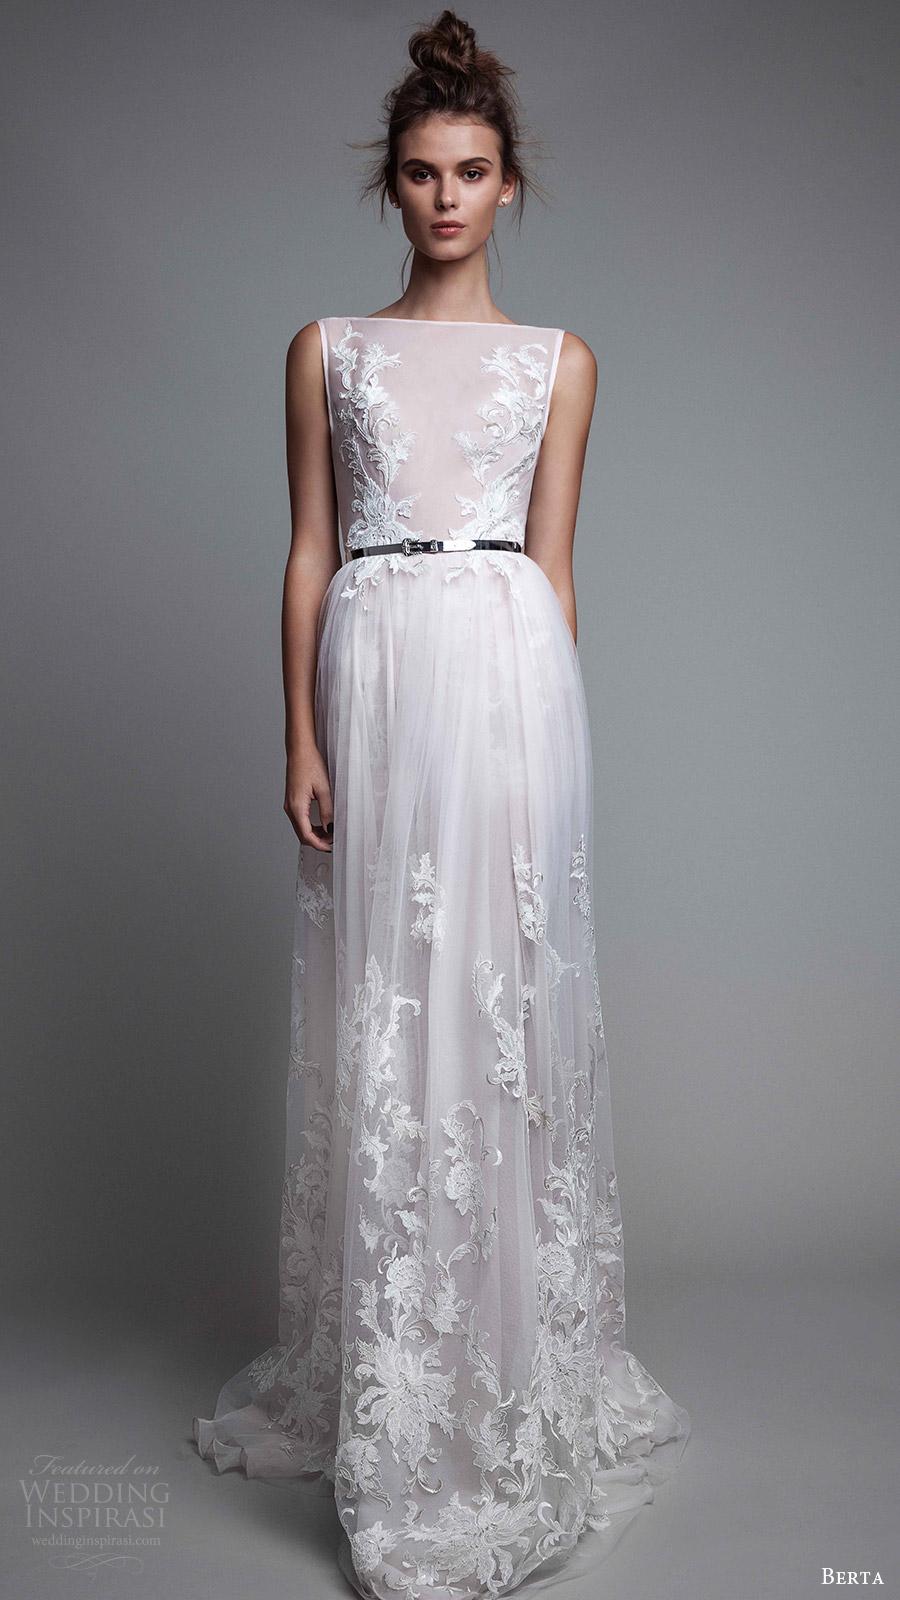 berta rtw fall 2017 (17 16) sleeveless bateau neck aline sheer bodice white wedding dress style evening gown mv